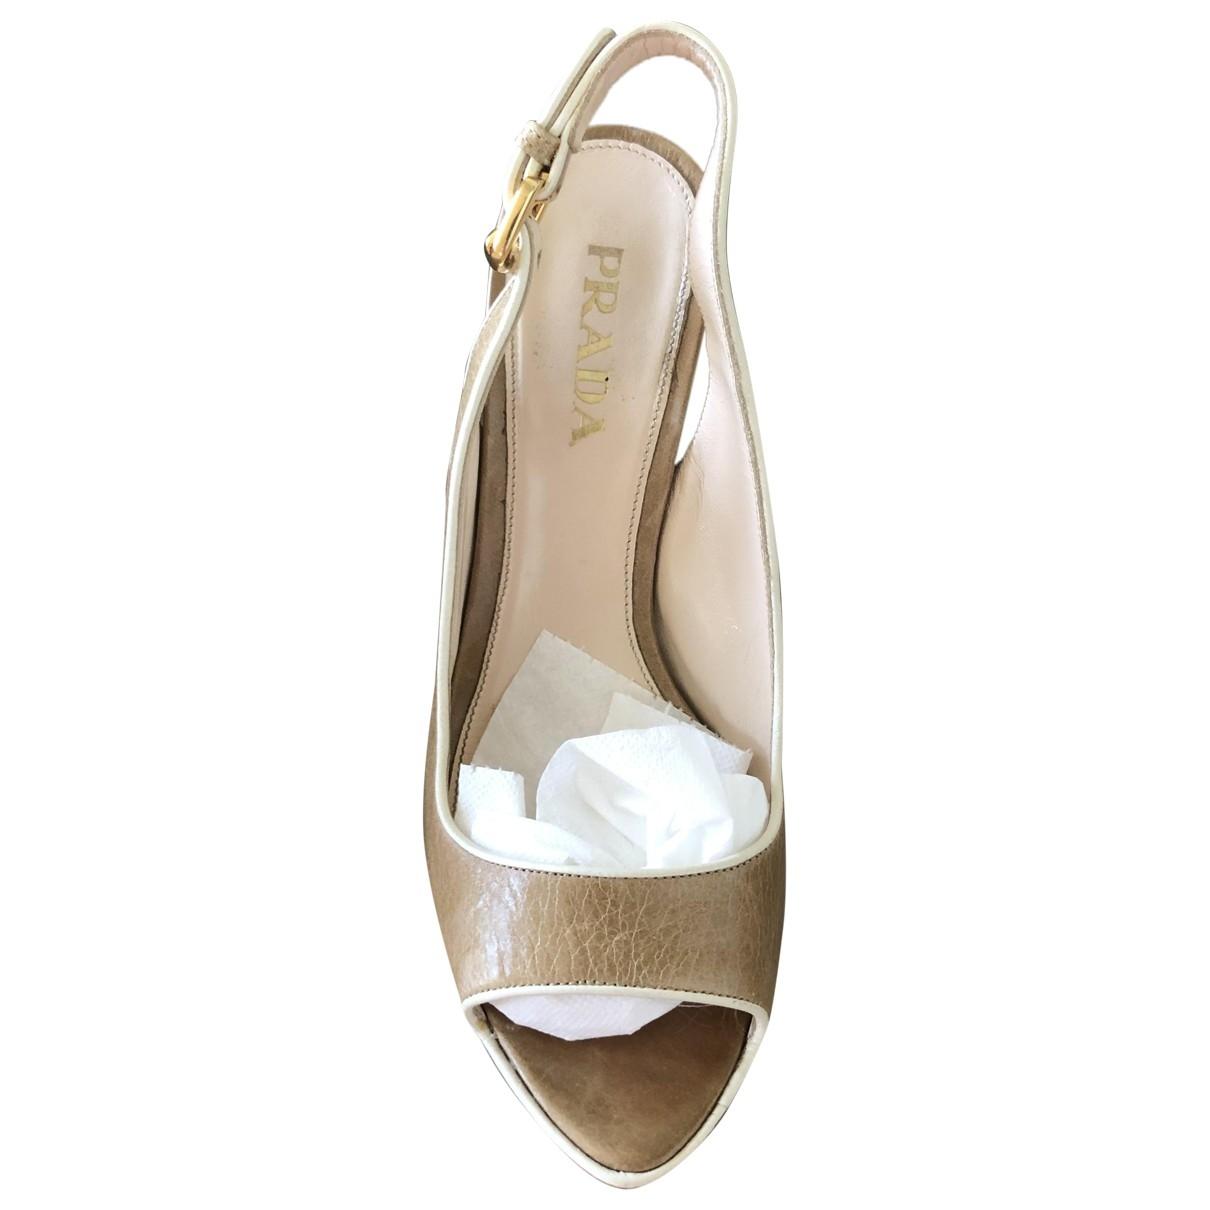 Prada \N Beige Leather Sandals for Women 35.5 EU